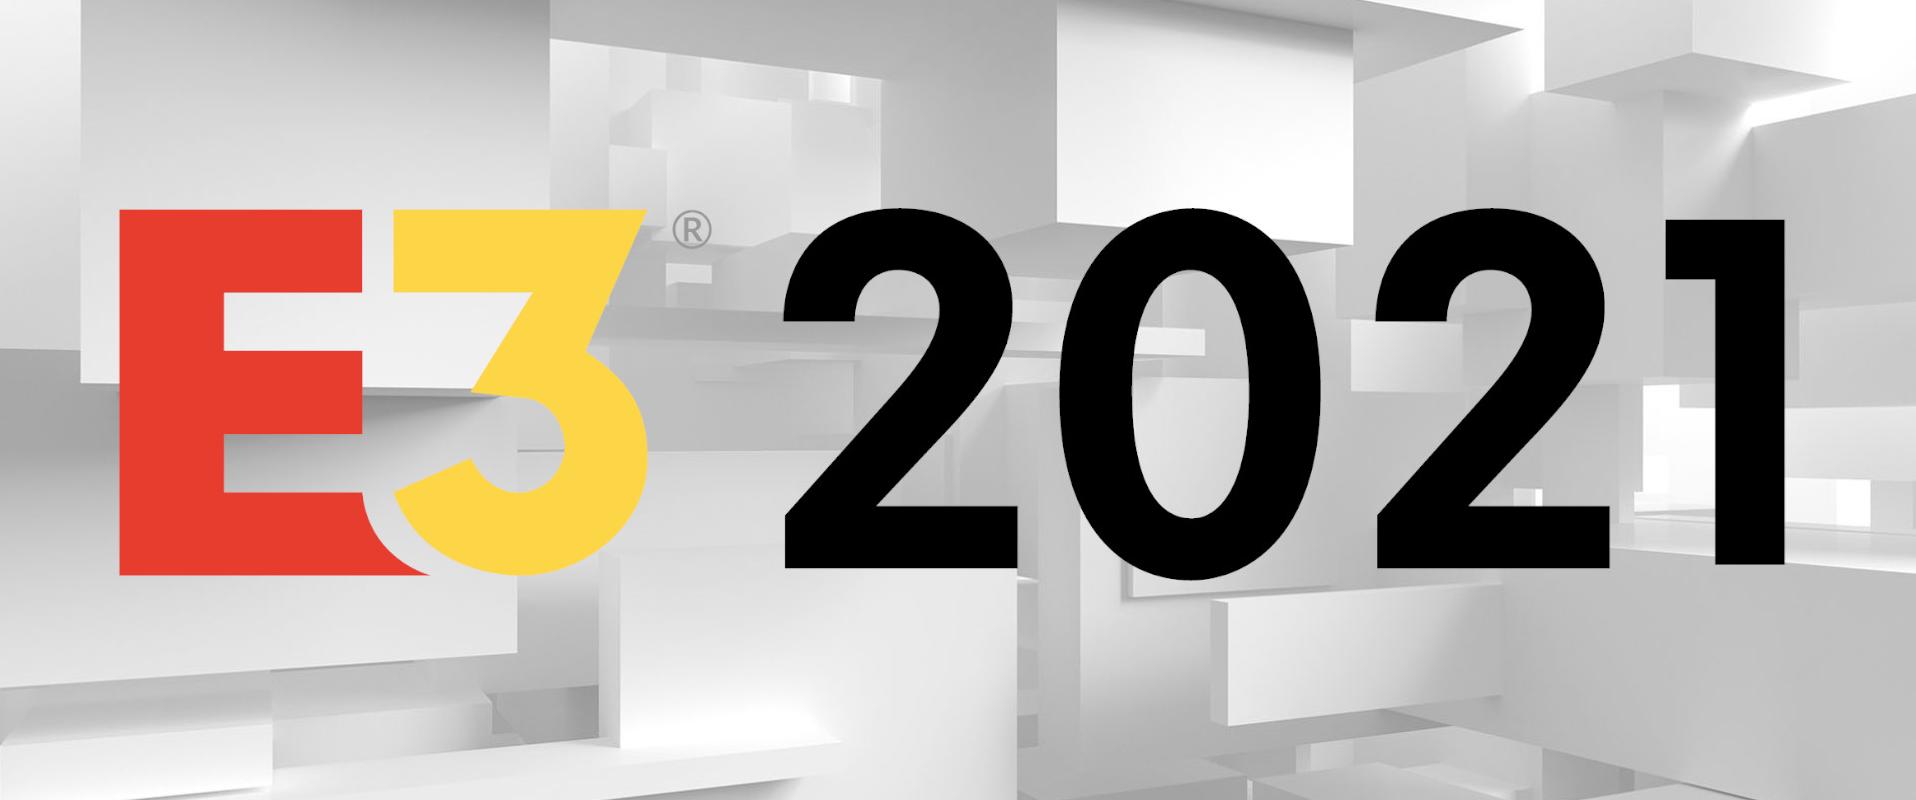 E3 2021 Full Recap